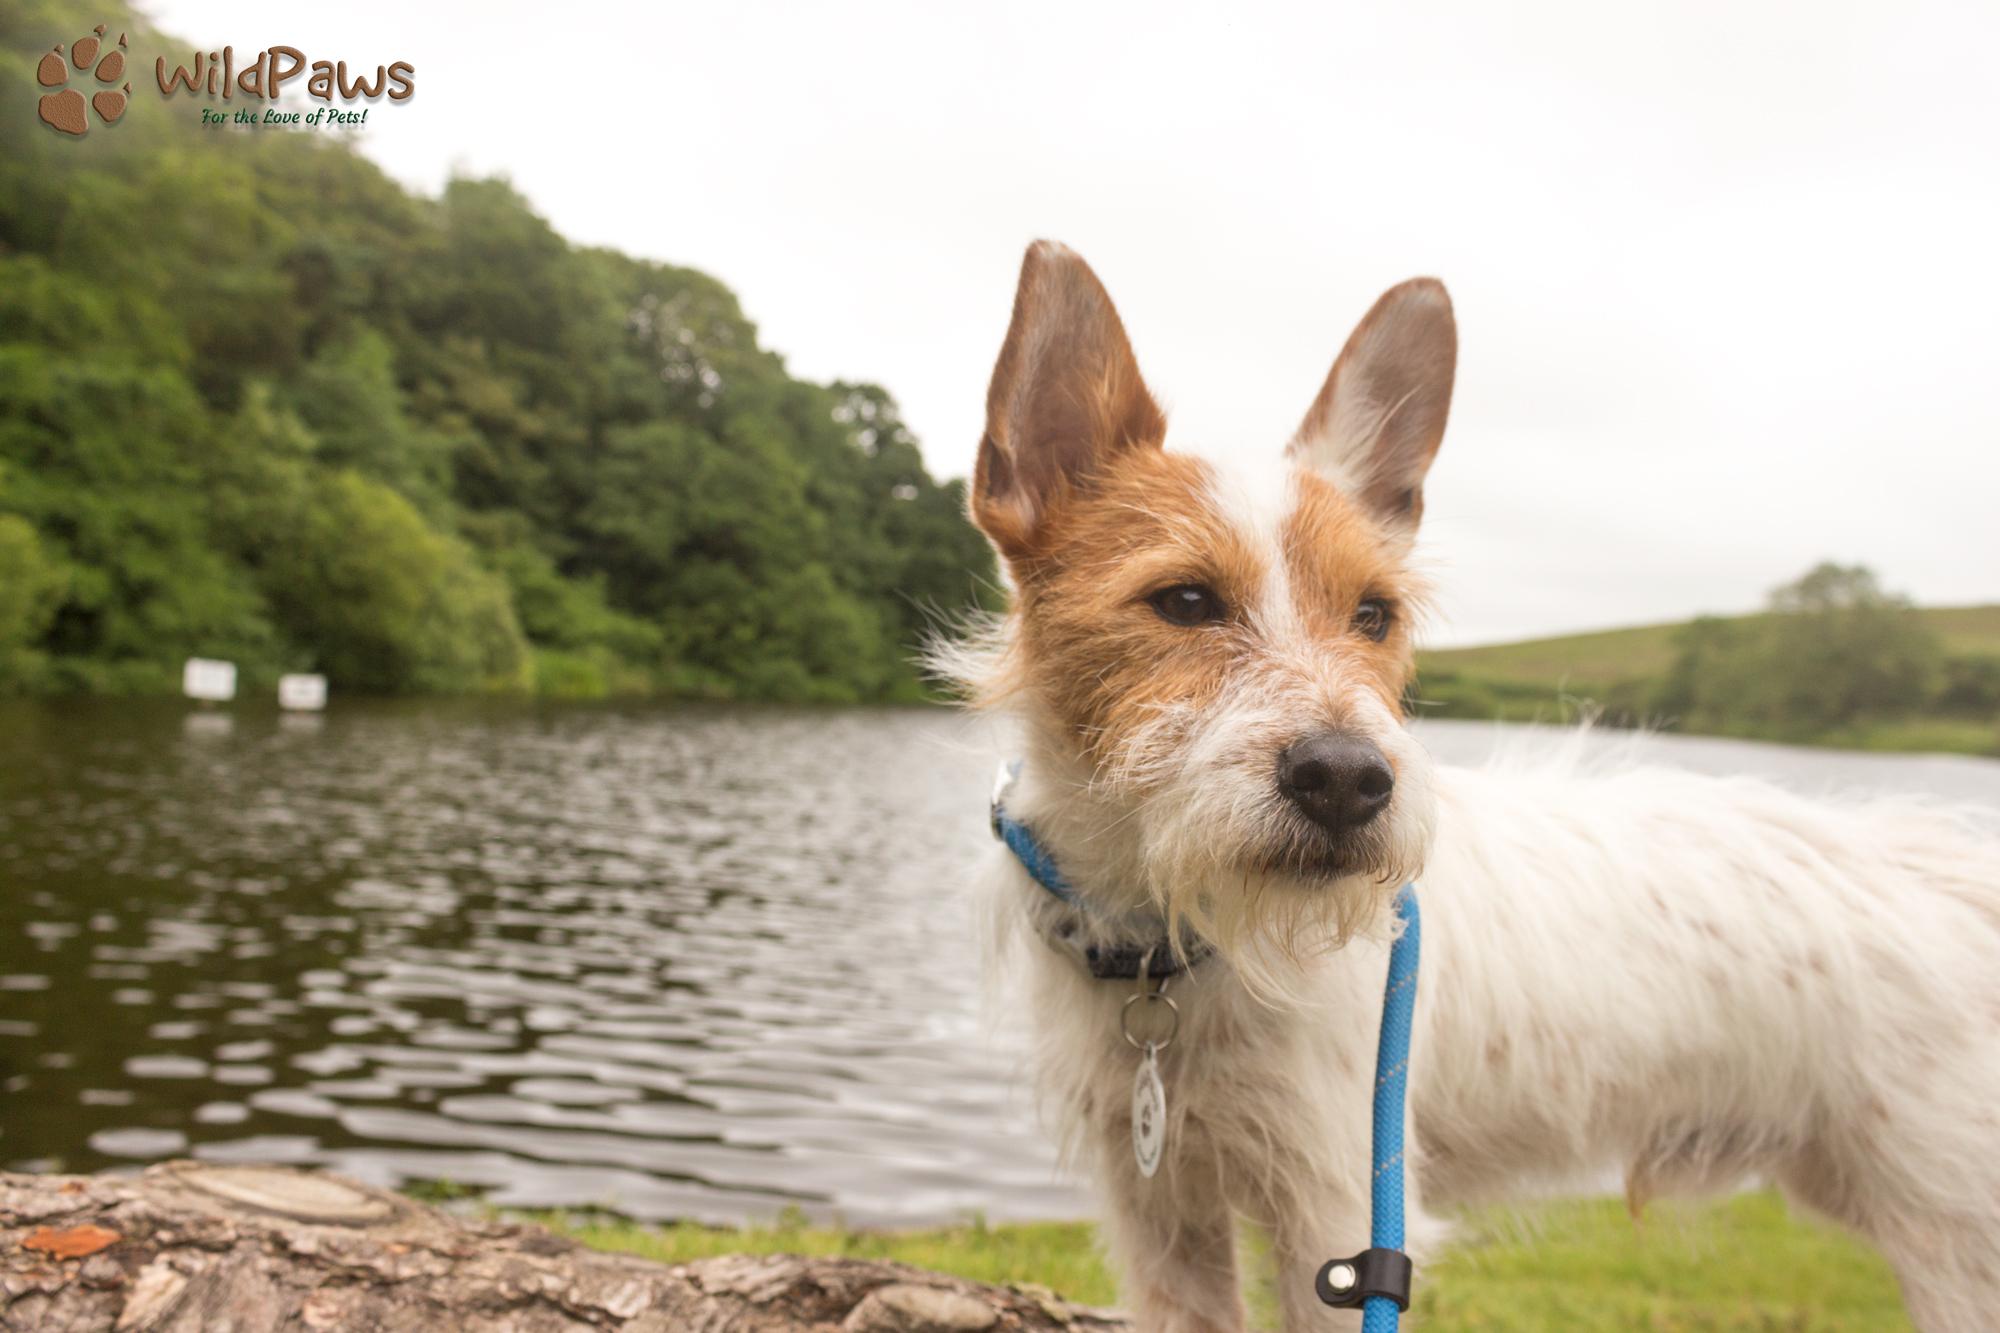 Wilbur WildPaws Online Pet Shop Ambassador at a Lake